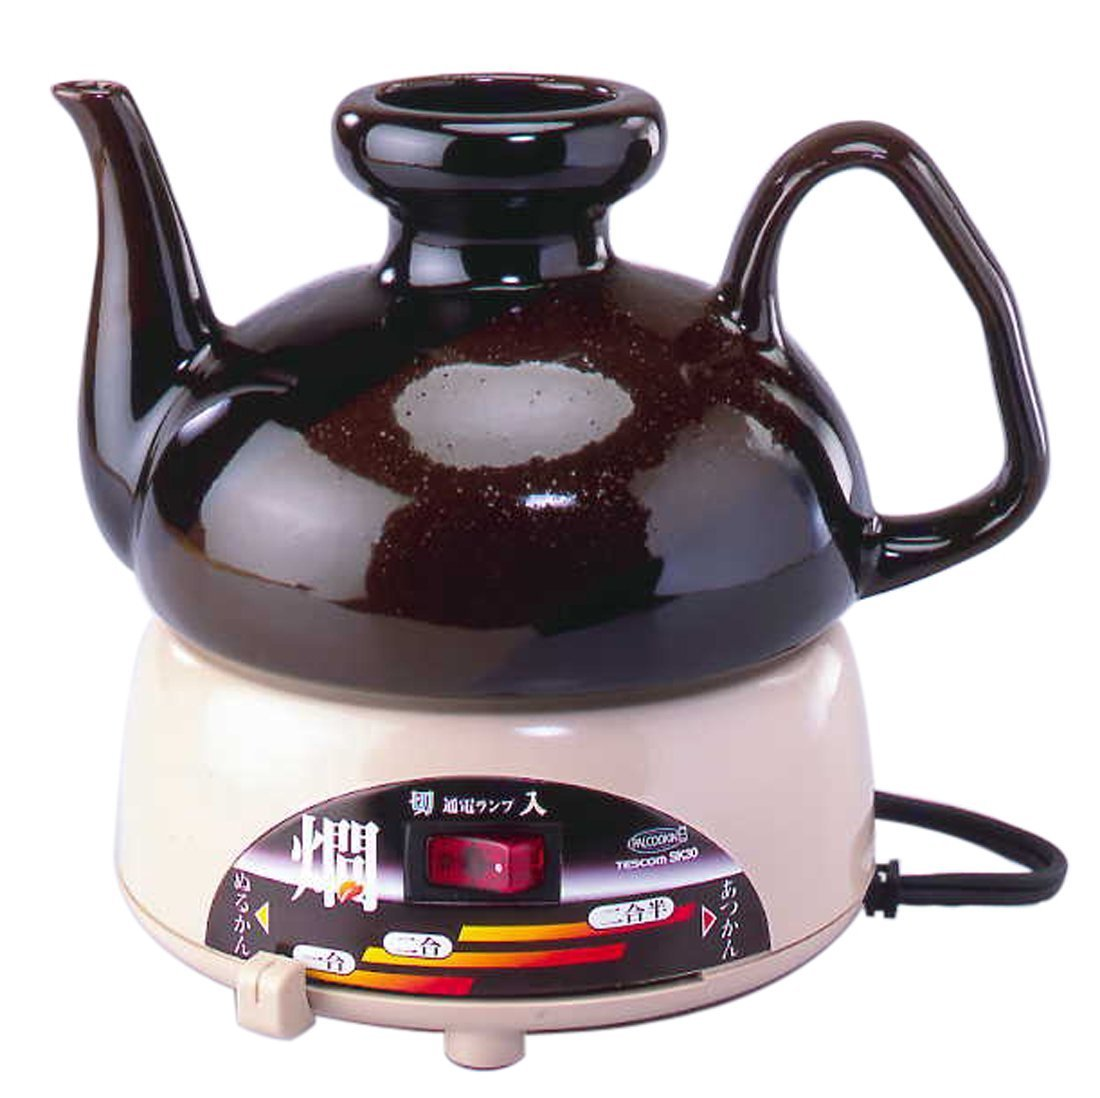 TESCOM Electric Hot Sake Maker